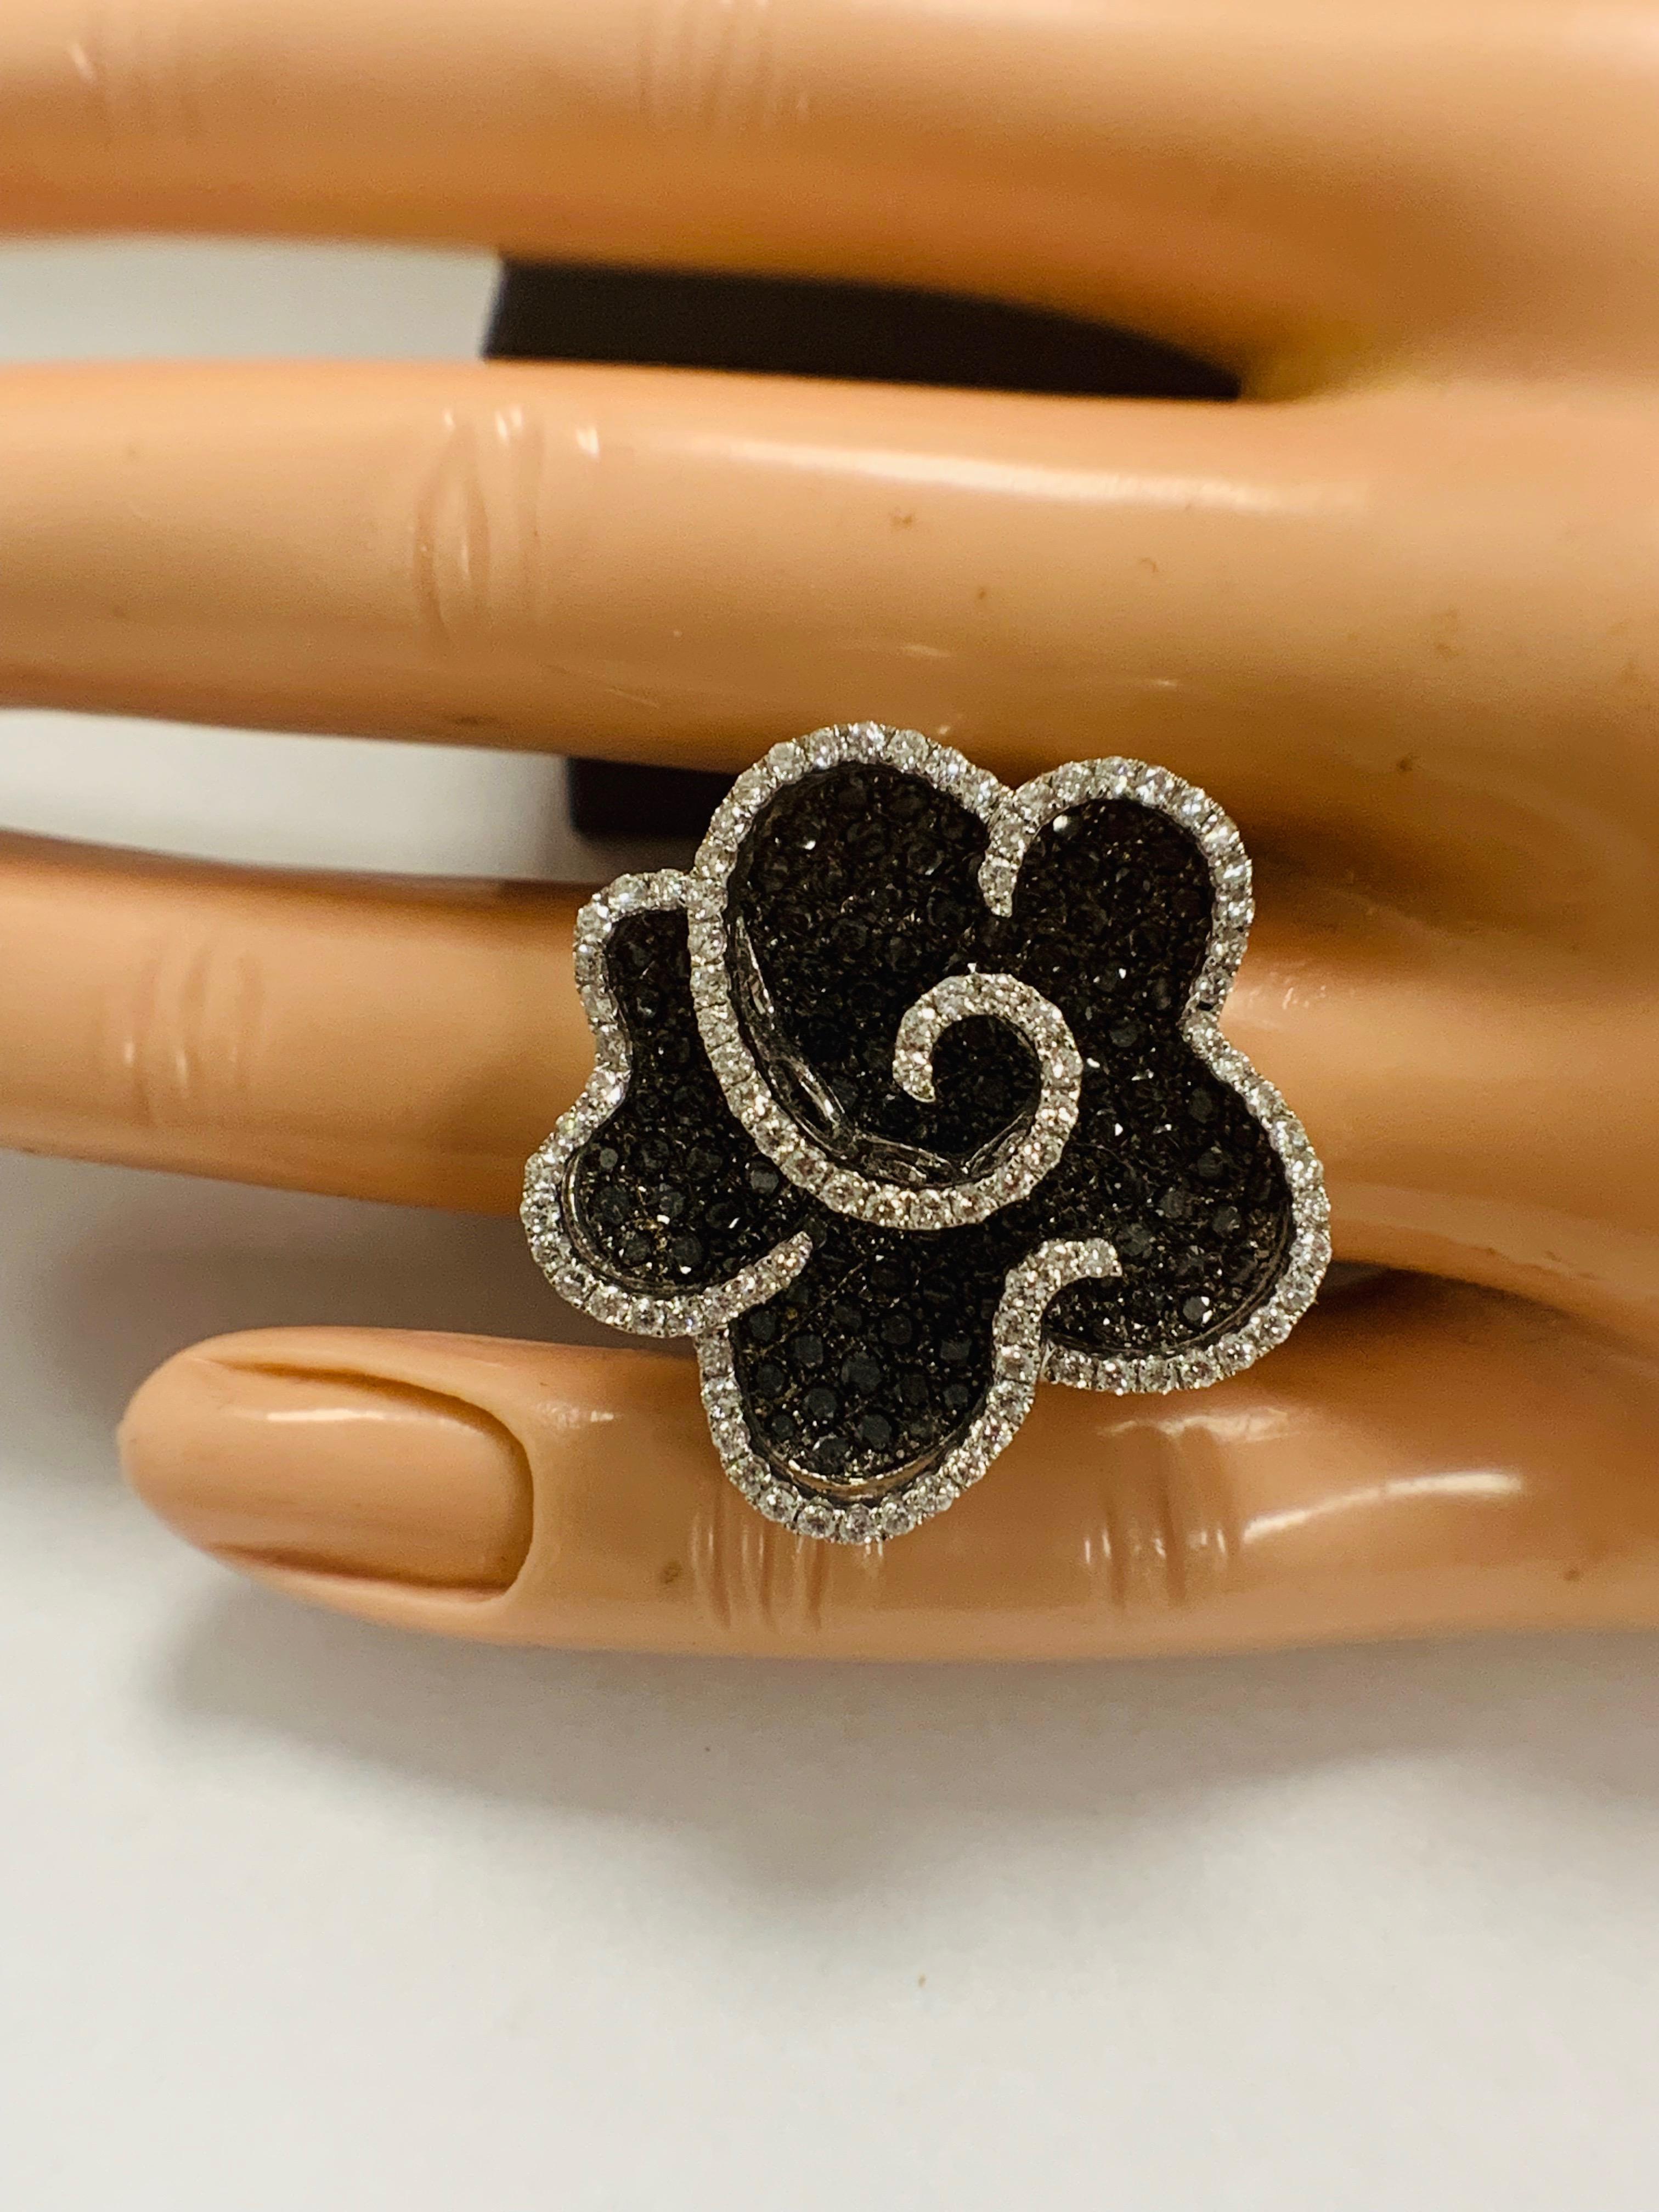 18ct White Gold Diamond flower design ring featuring 123 round cut, black Diamonds (2.25ct TBDW) - Image 12 of 13